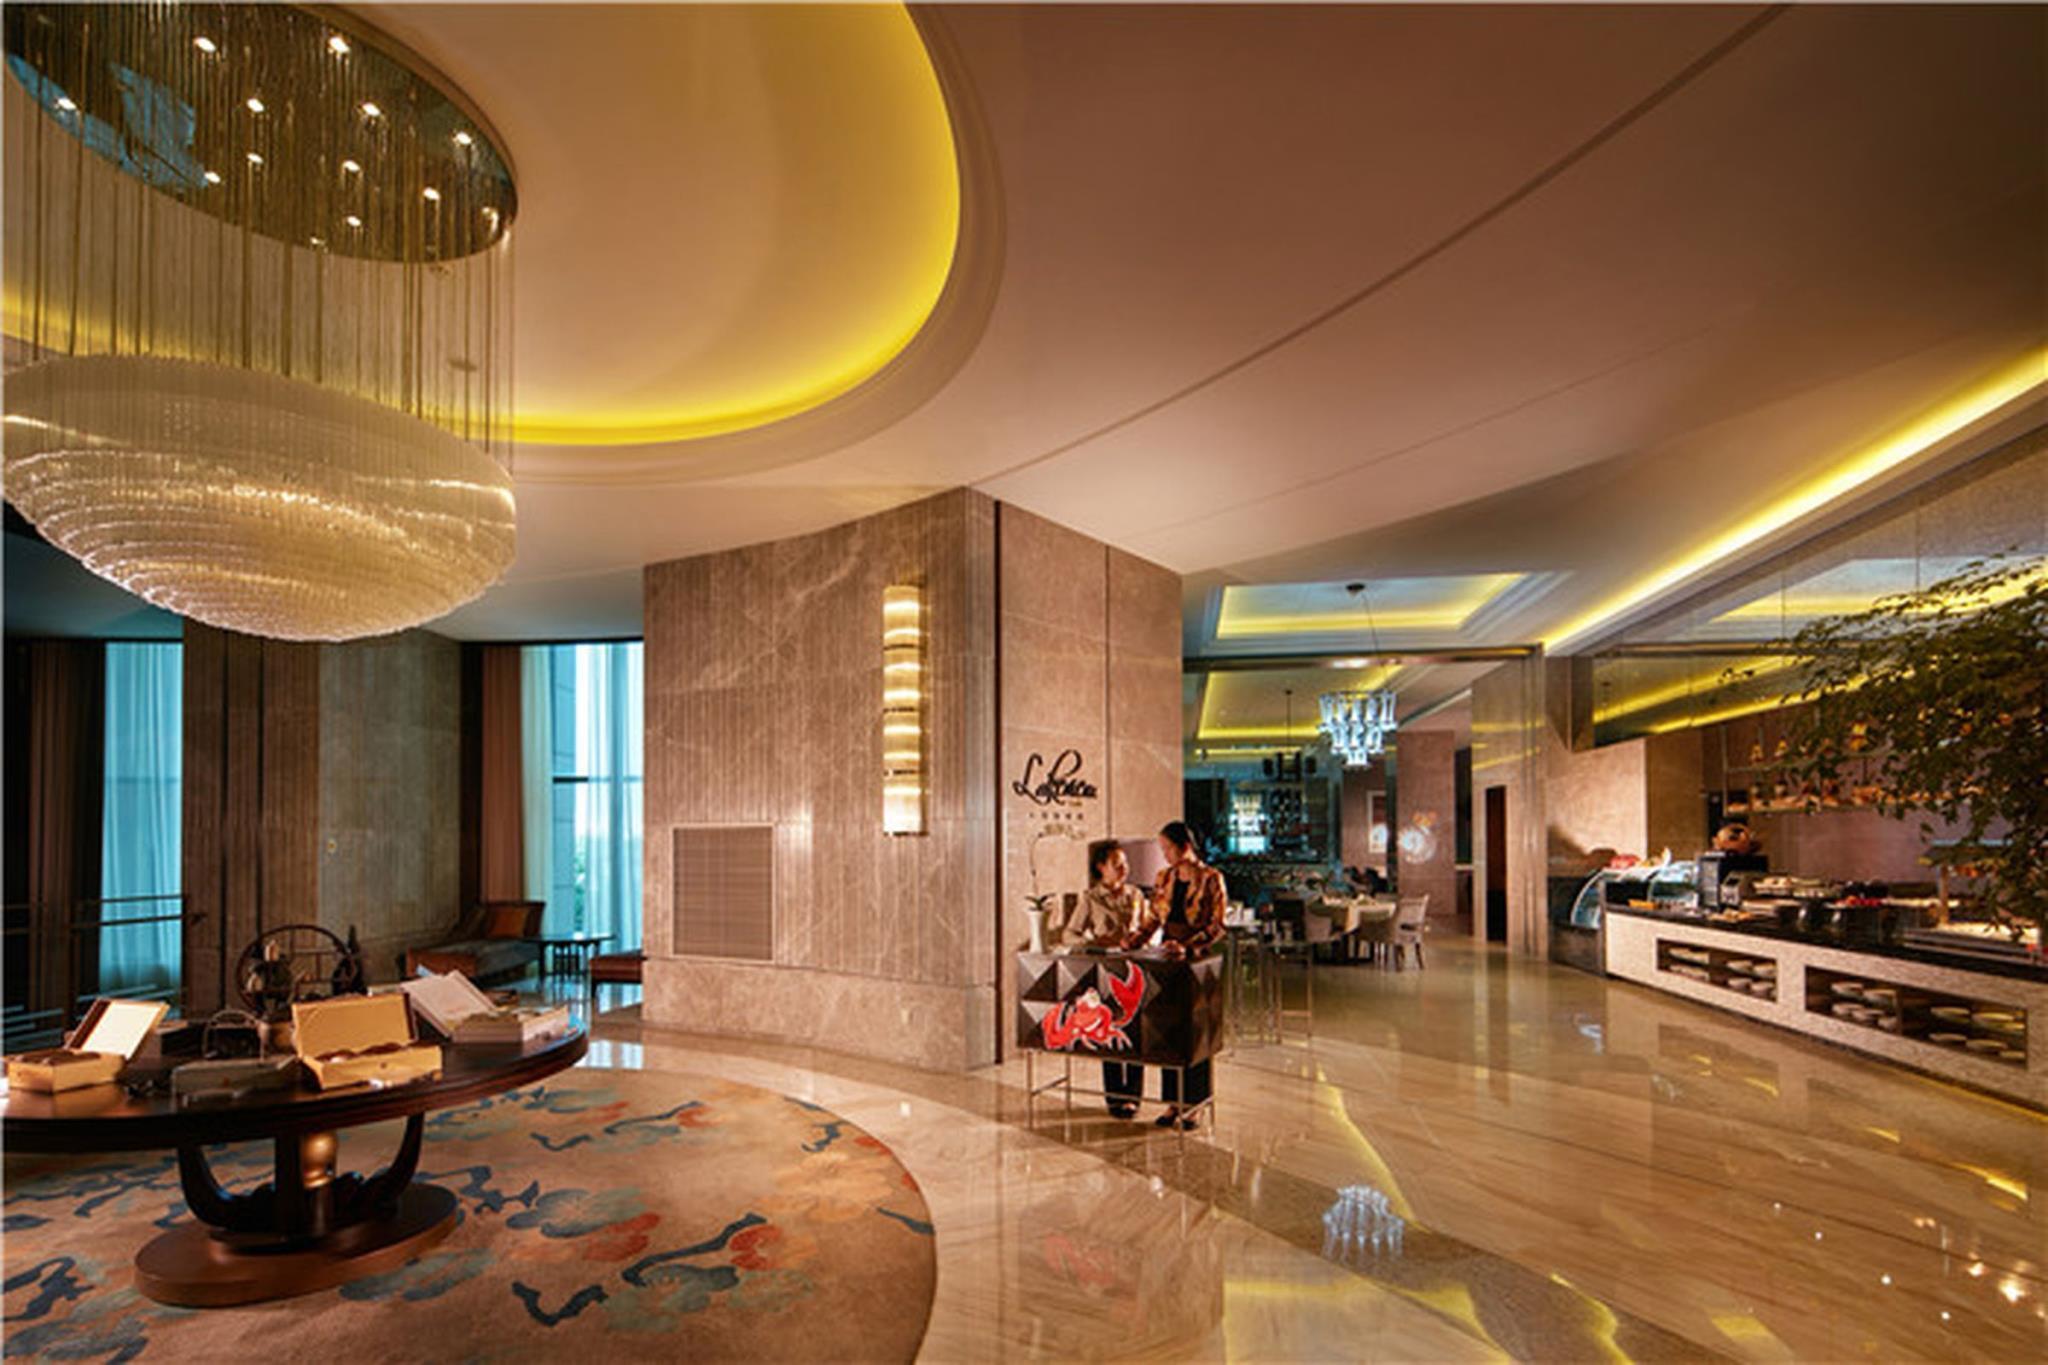 Grand New Century Kaimei Hotel, Nanchang